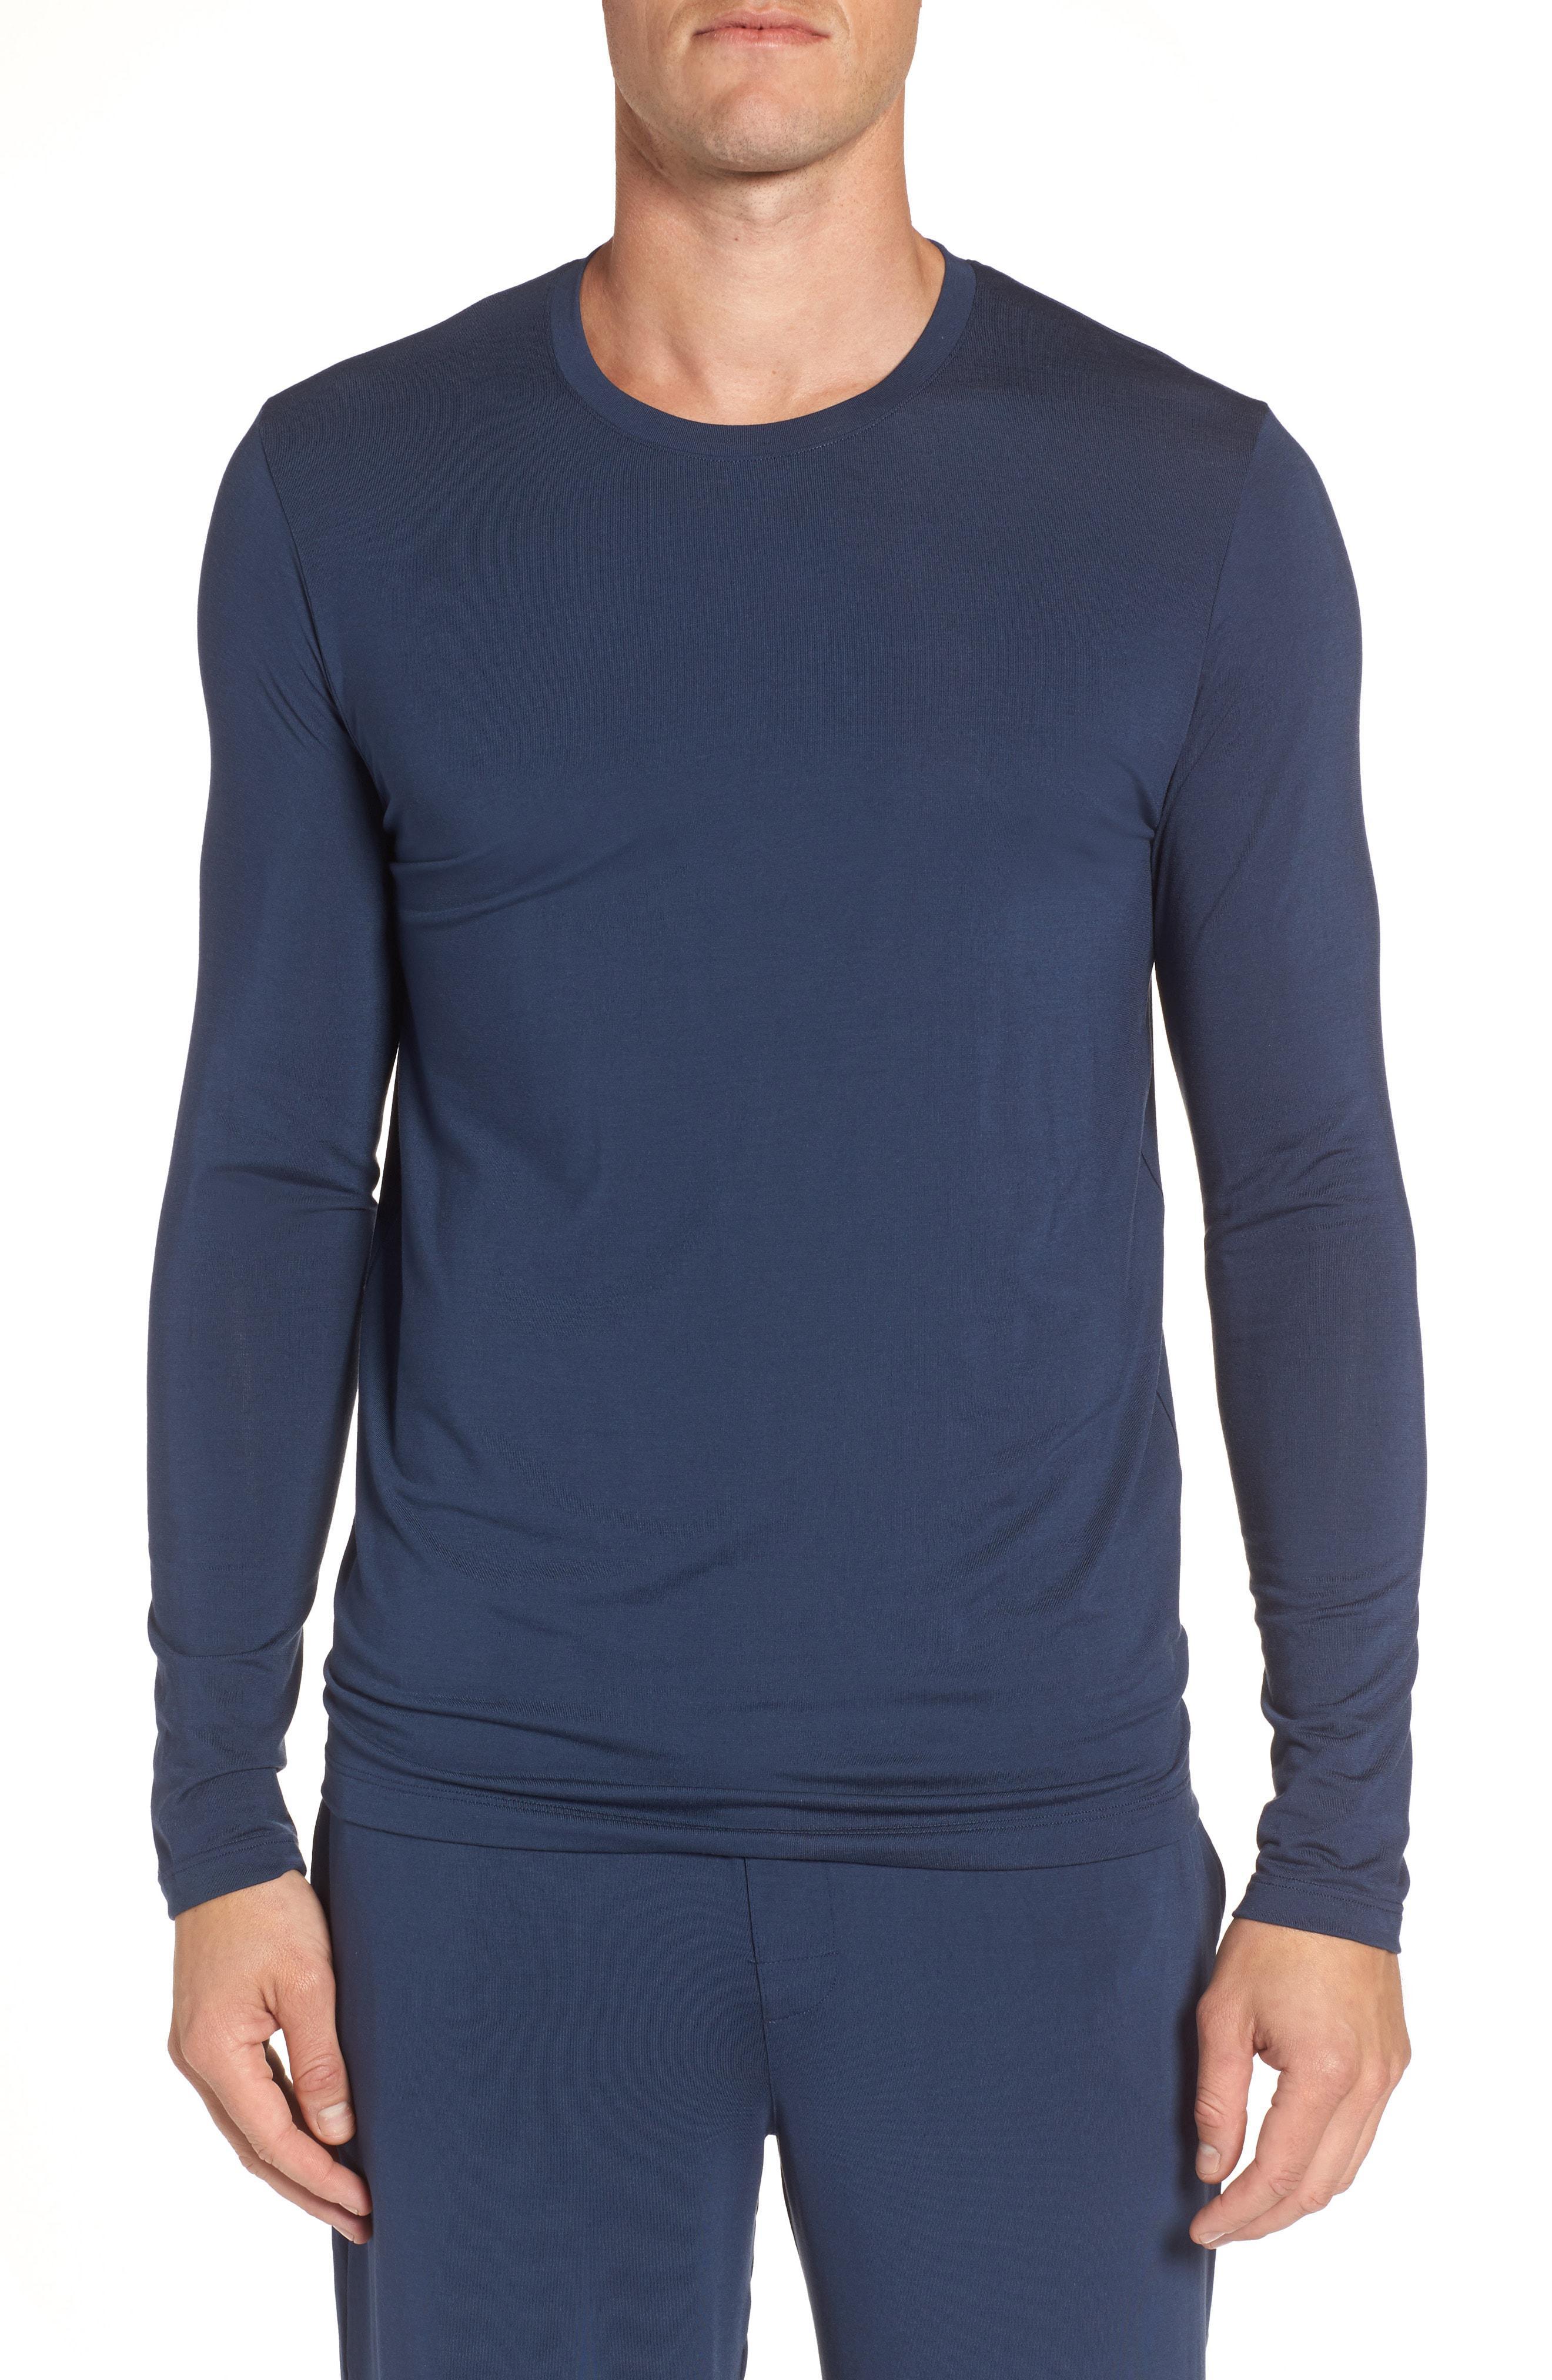 8d413ba0e6b8da Lyst - Tommy John Second Skin T-shirt in Blue for Men